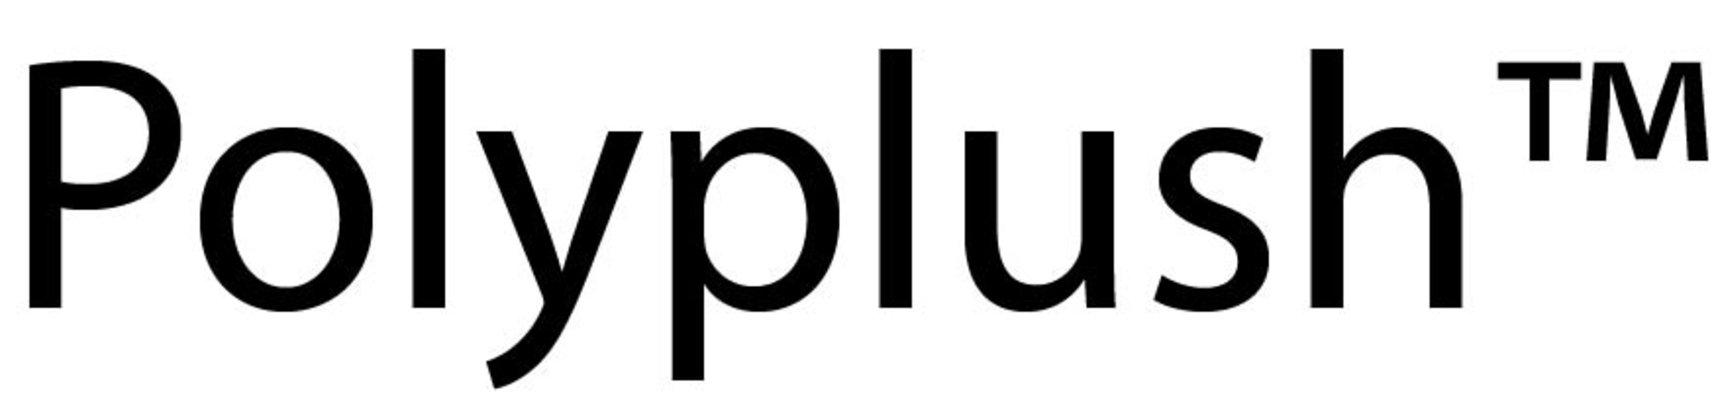 Polyplush logo